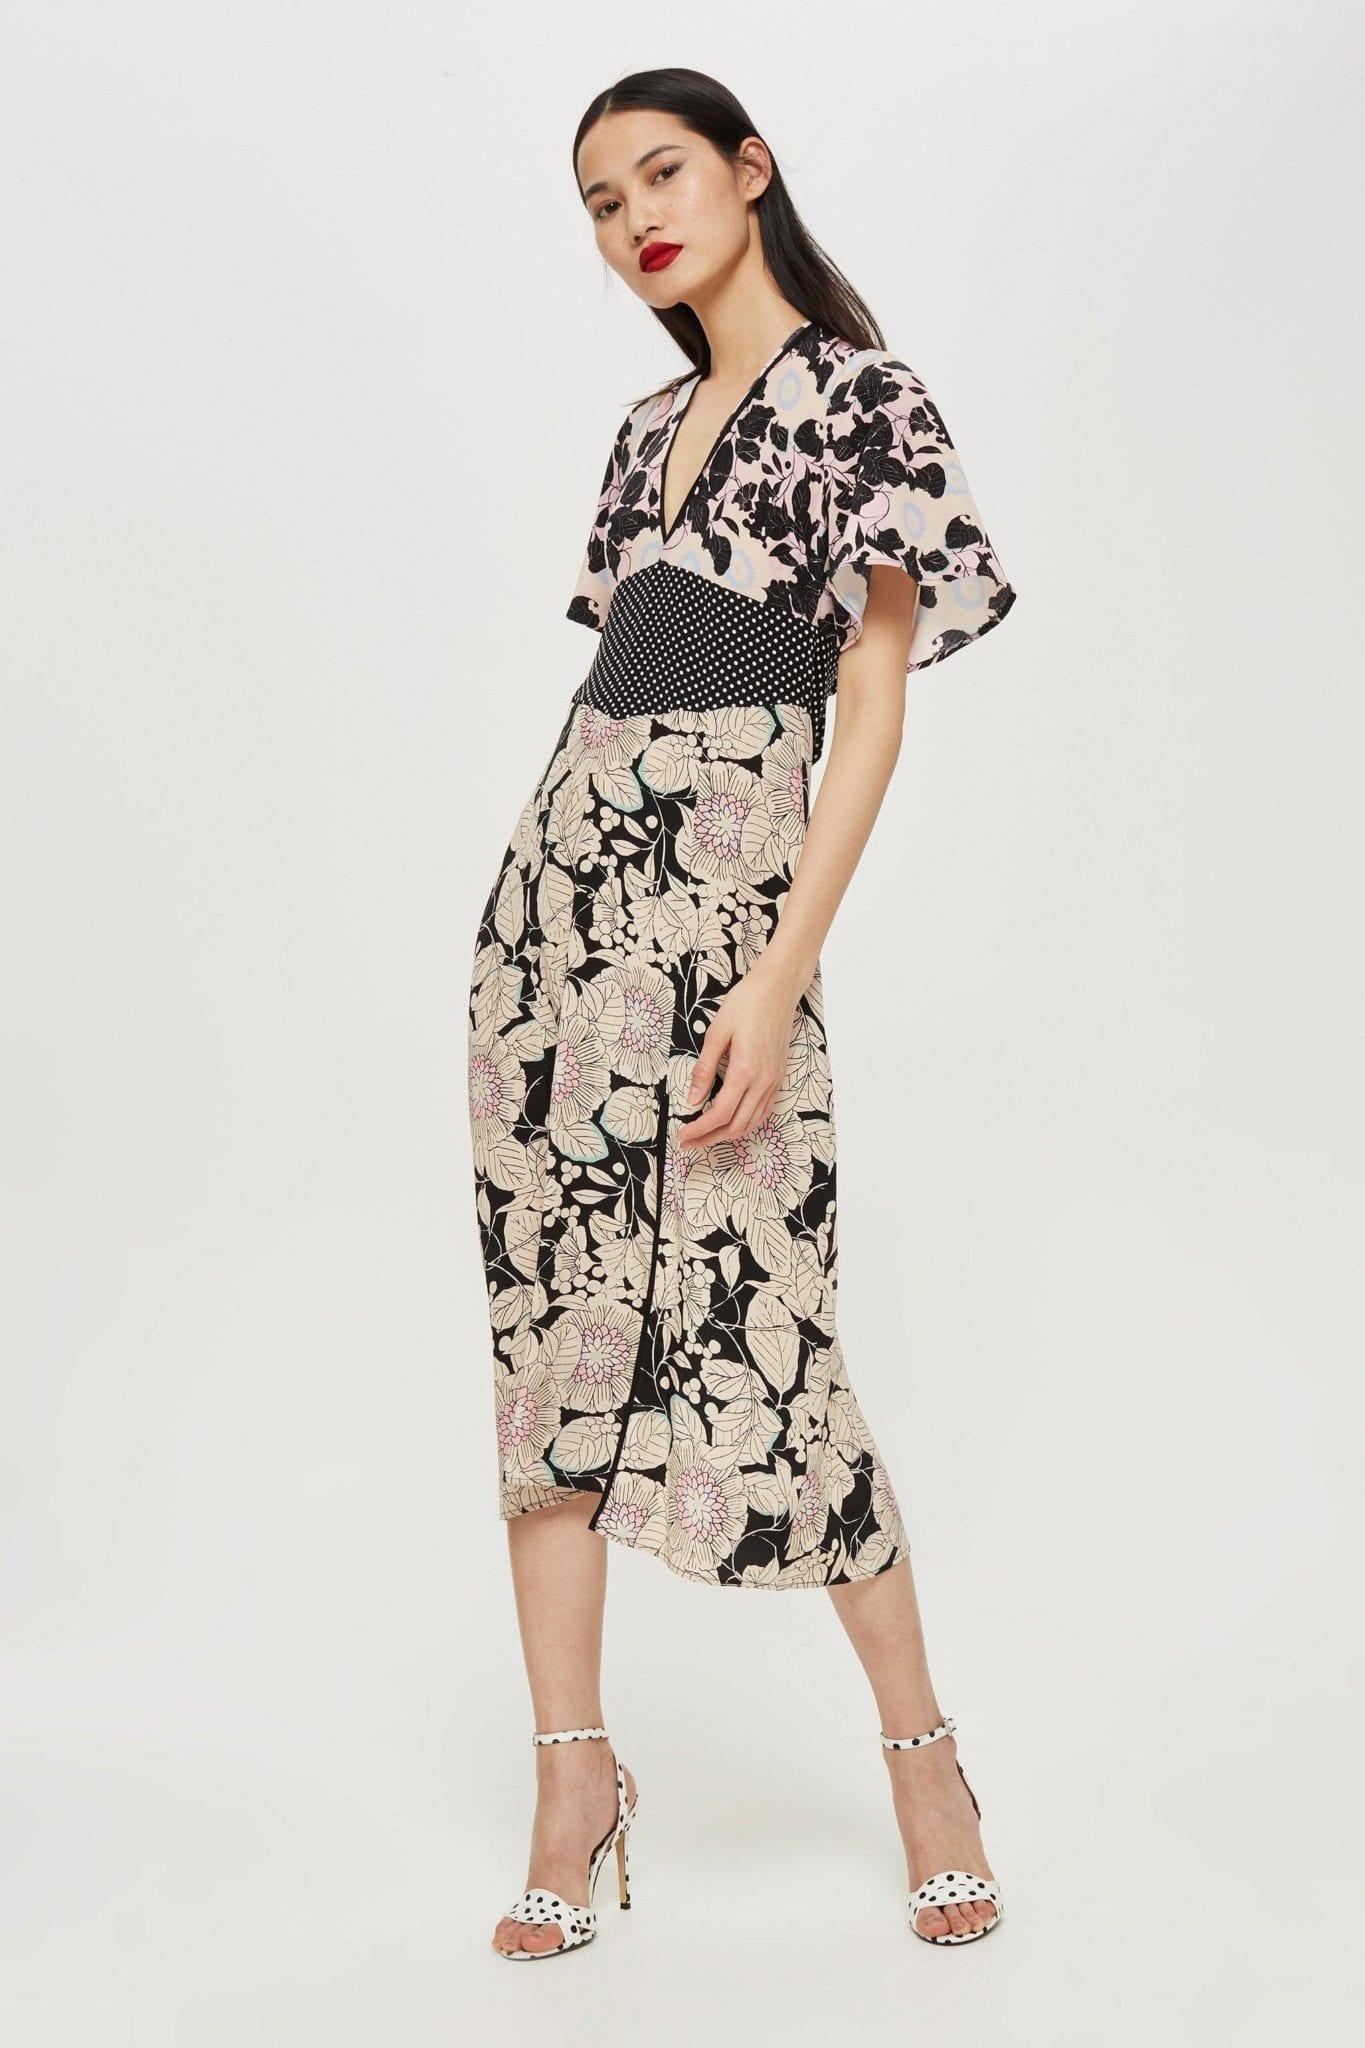 TOP SHOP Mix Midi Black / Floral Printed Dress